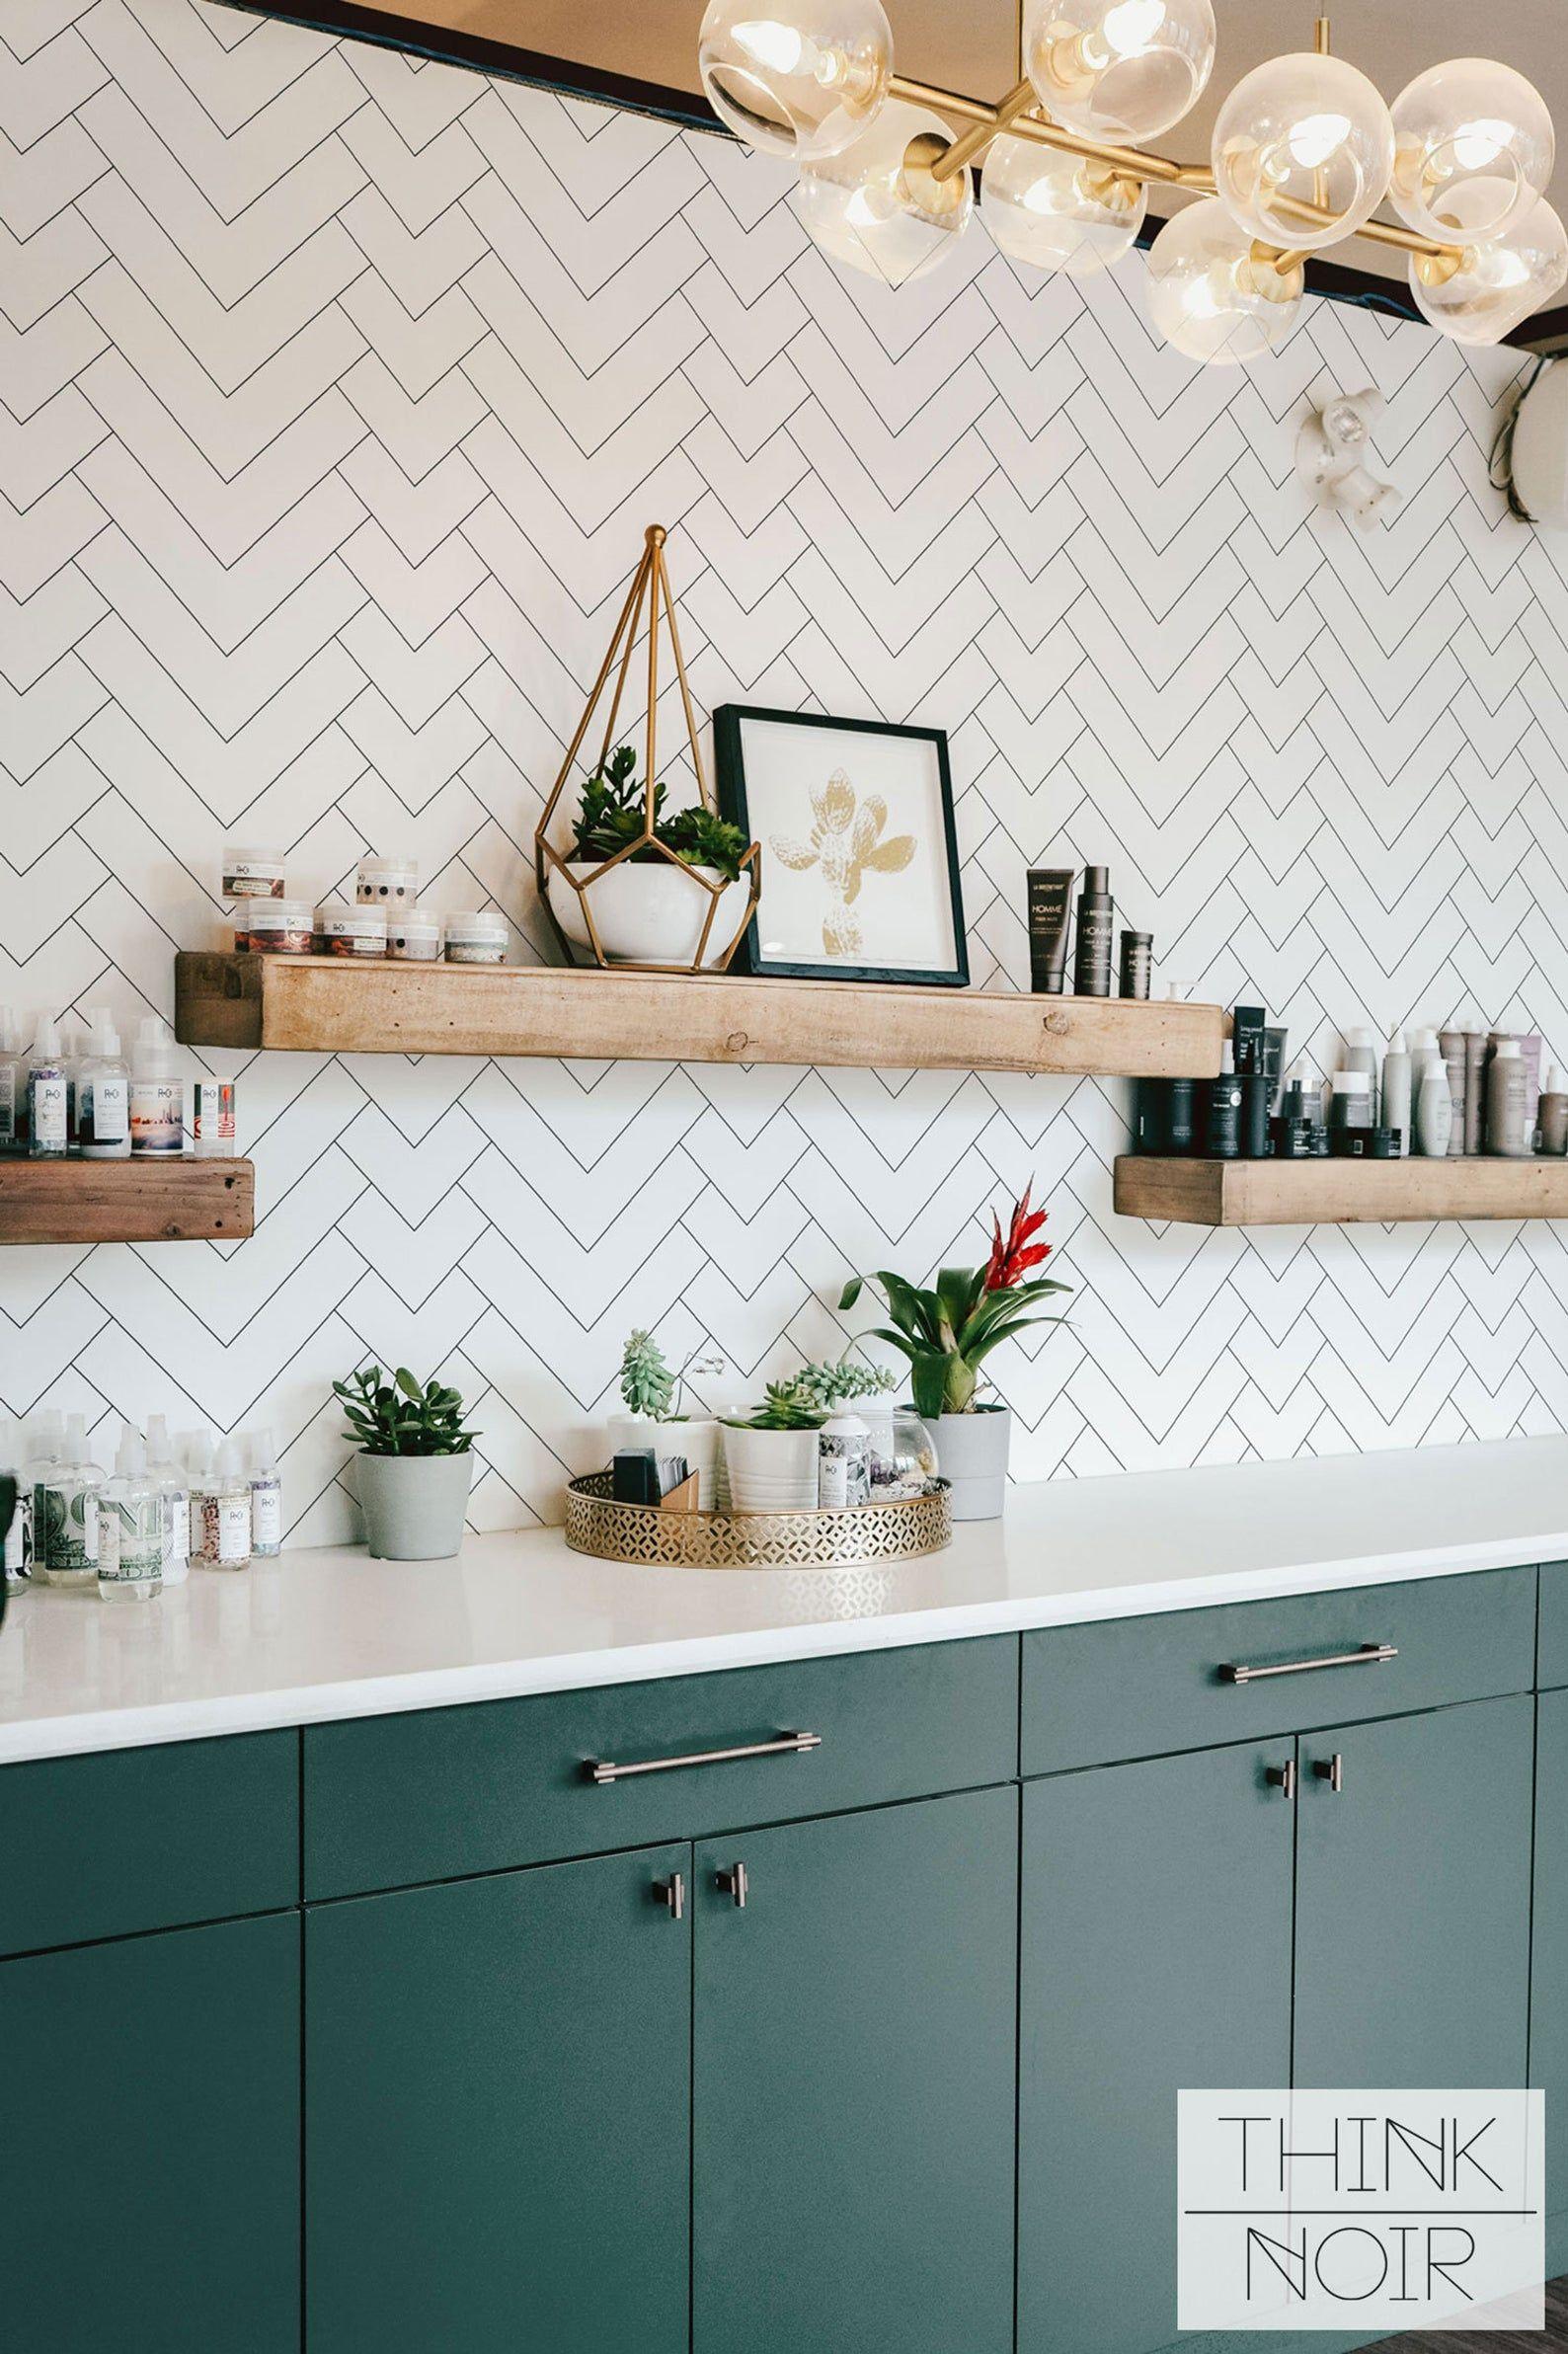 Minimalistic Geometric Pattern Regular Wallpaper Simple Etsy In 2020 Kitchen Wallpaper Herringbone Wallpaper Geometric Wall